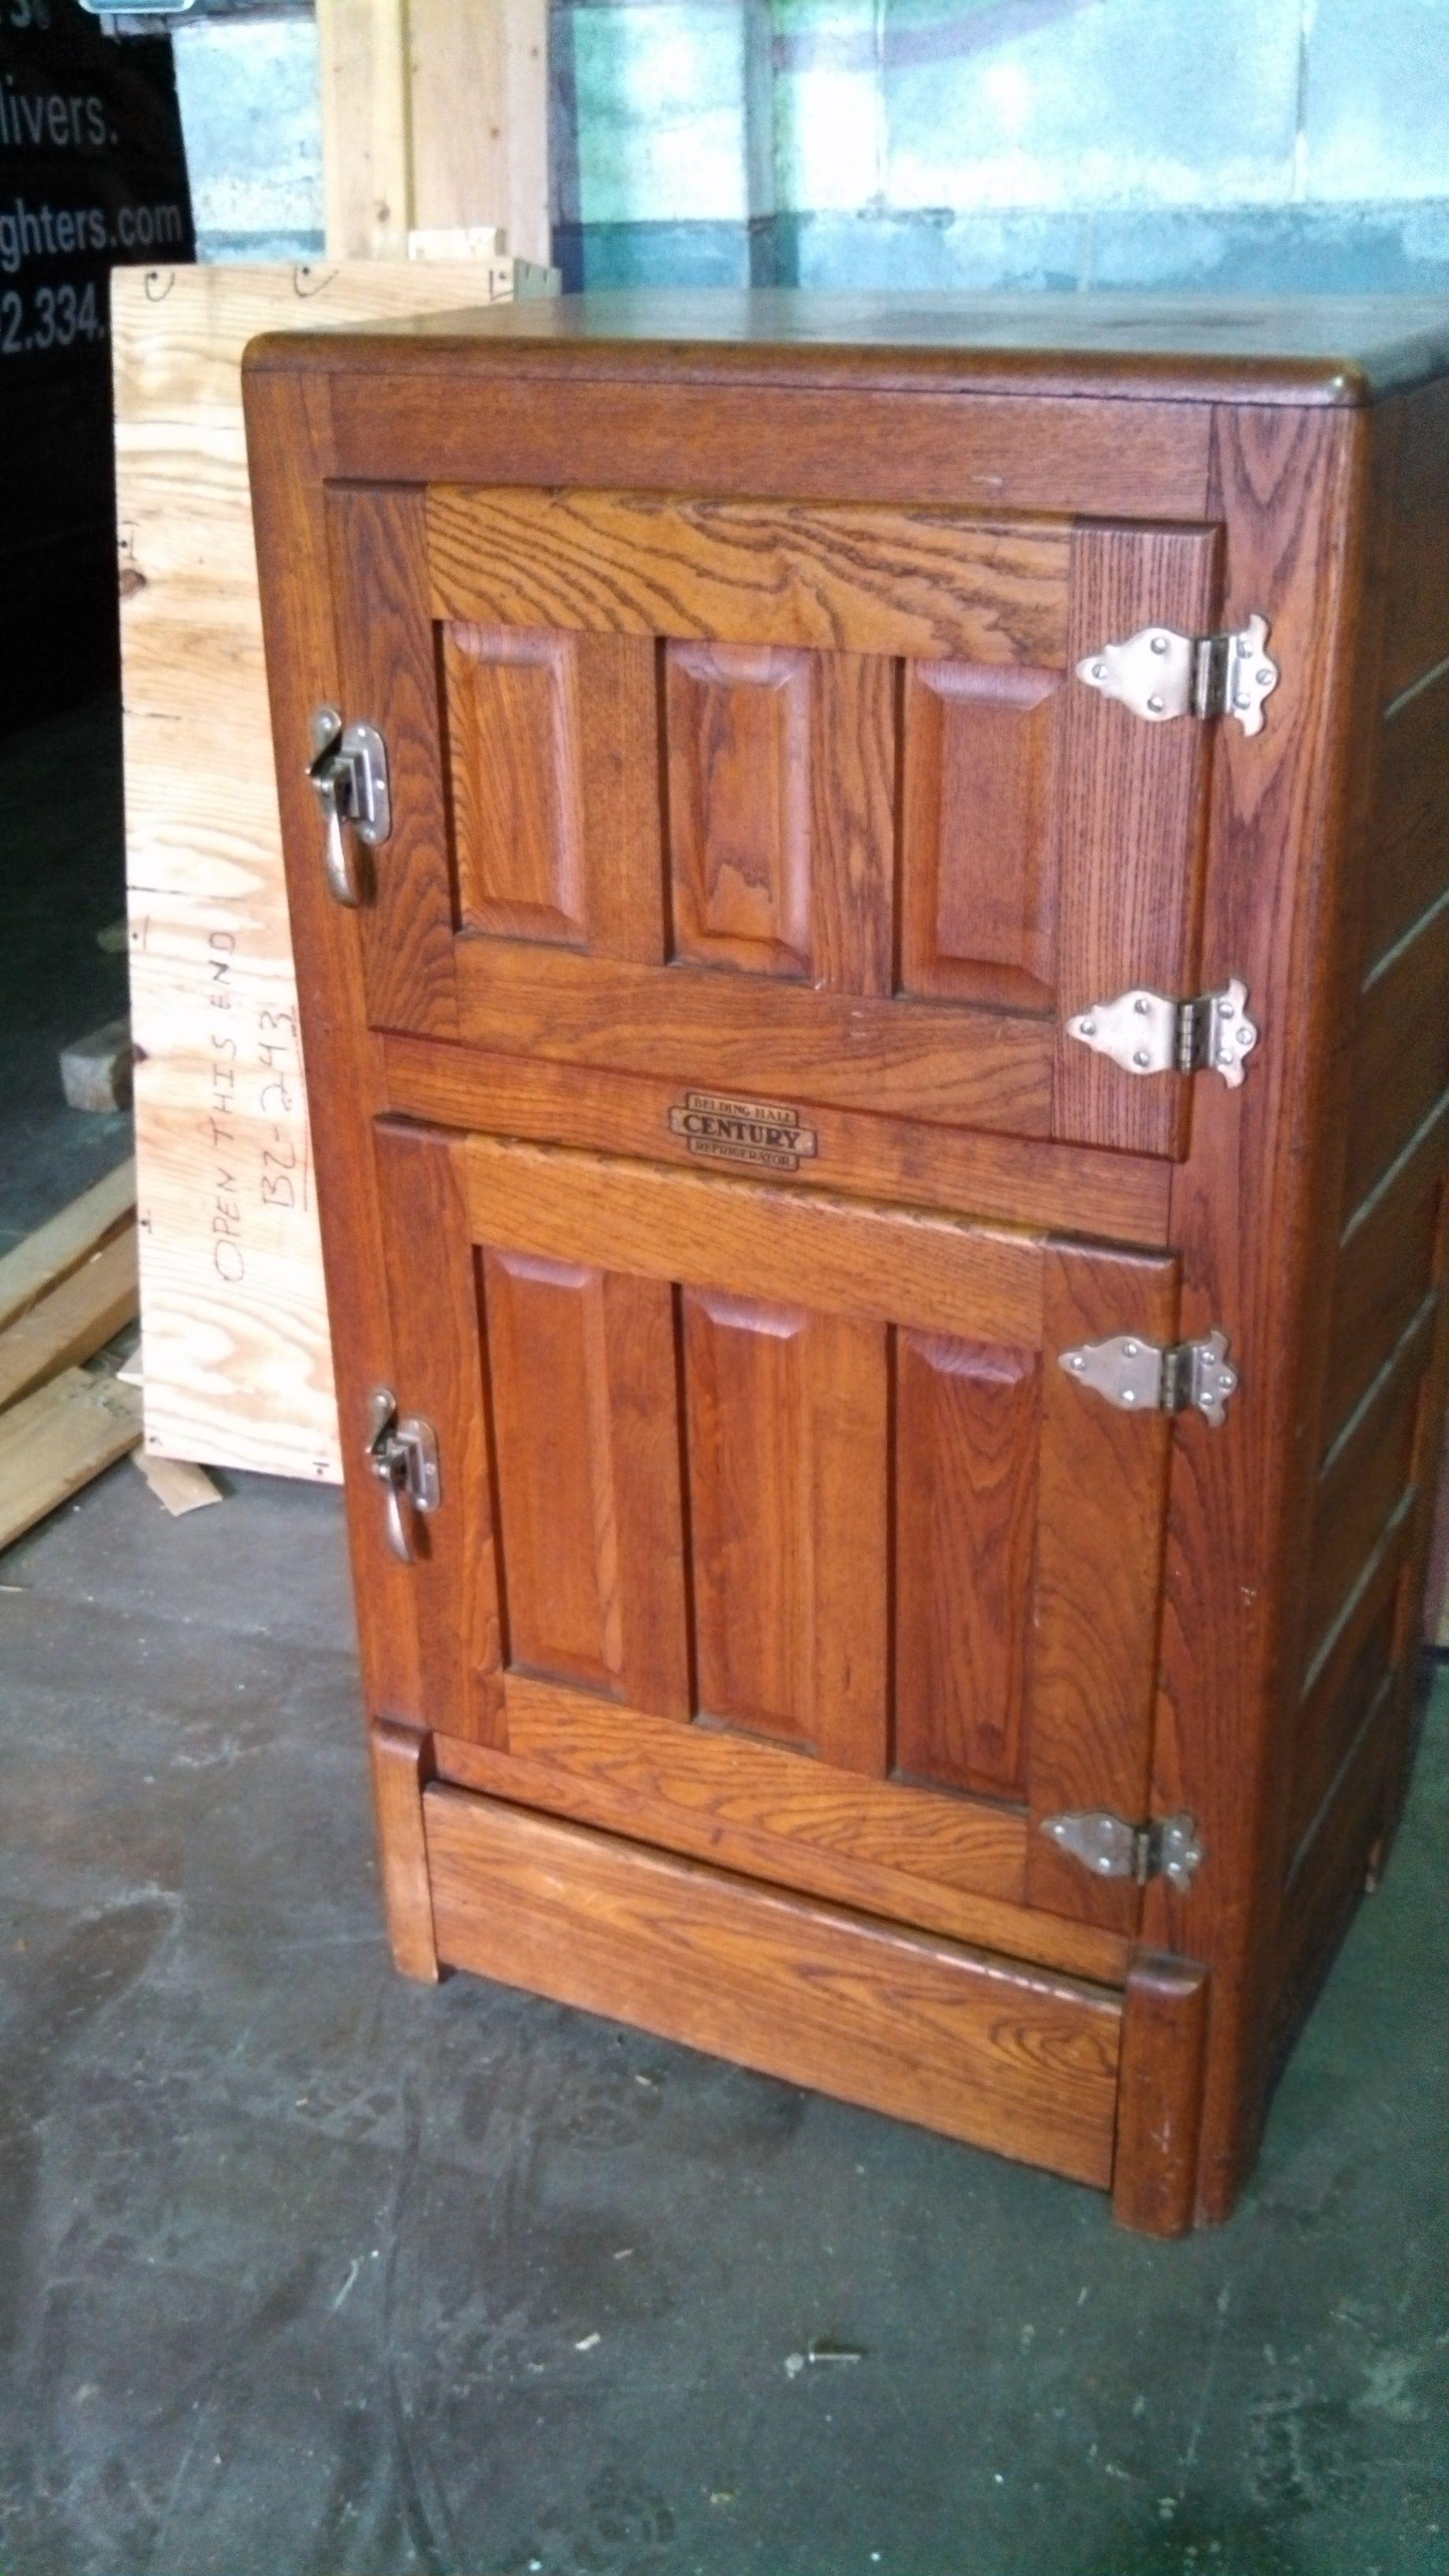 Antique Refrigerator Antique Ice Box Vintage Ice Box Vintage Refrigerator